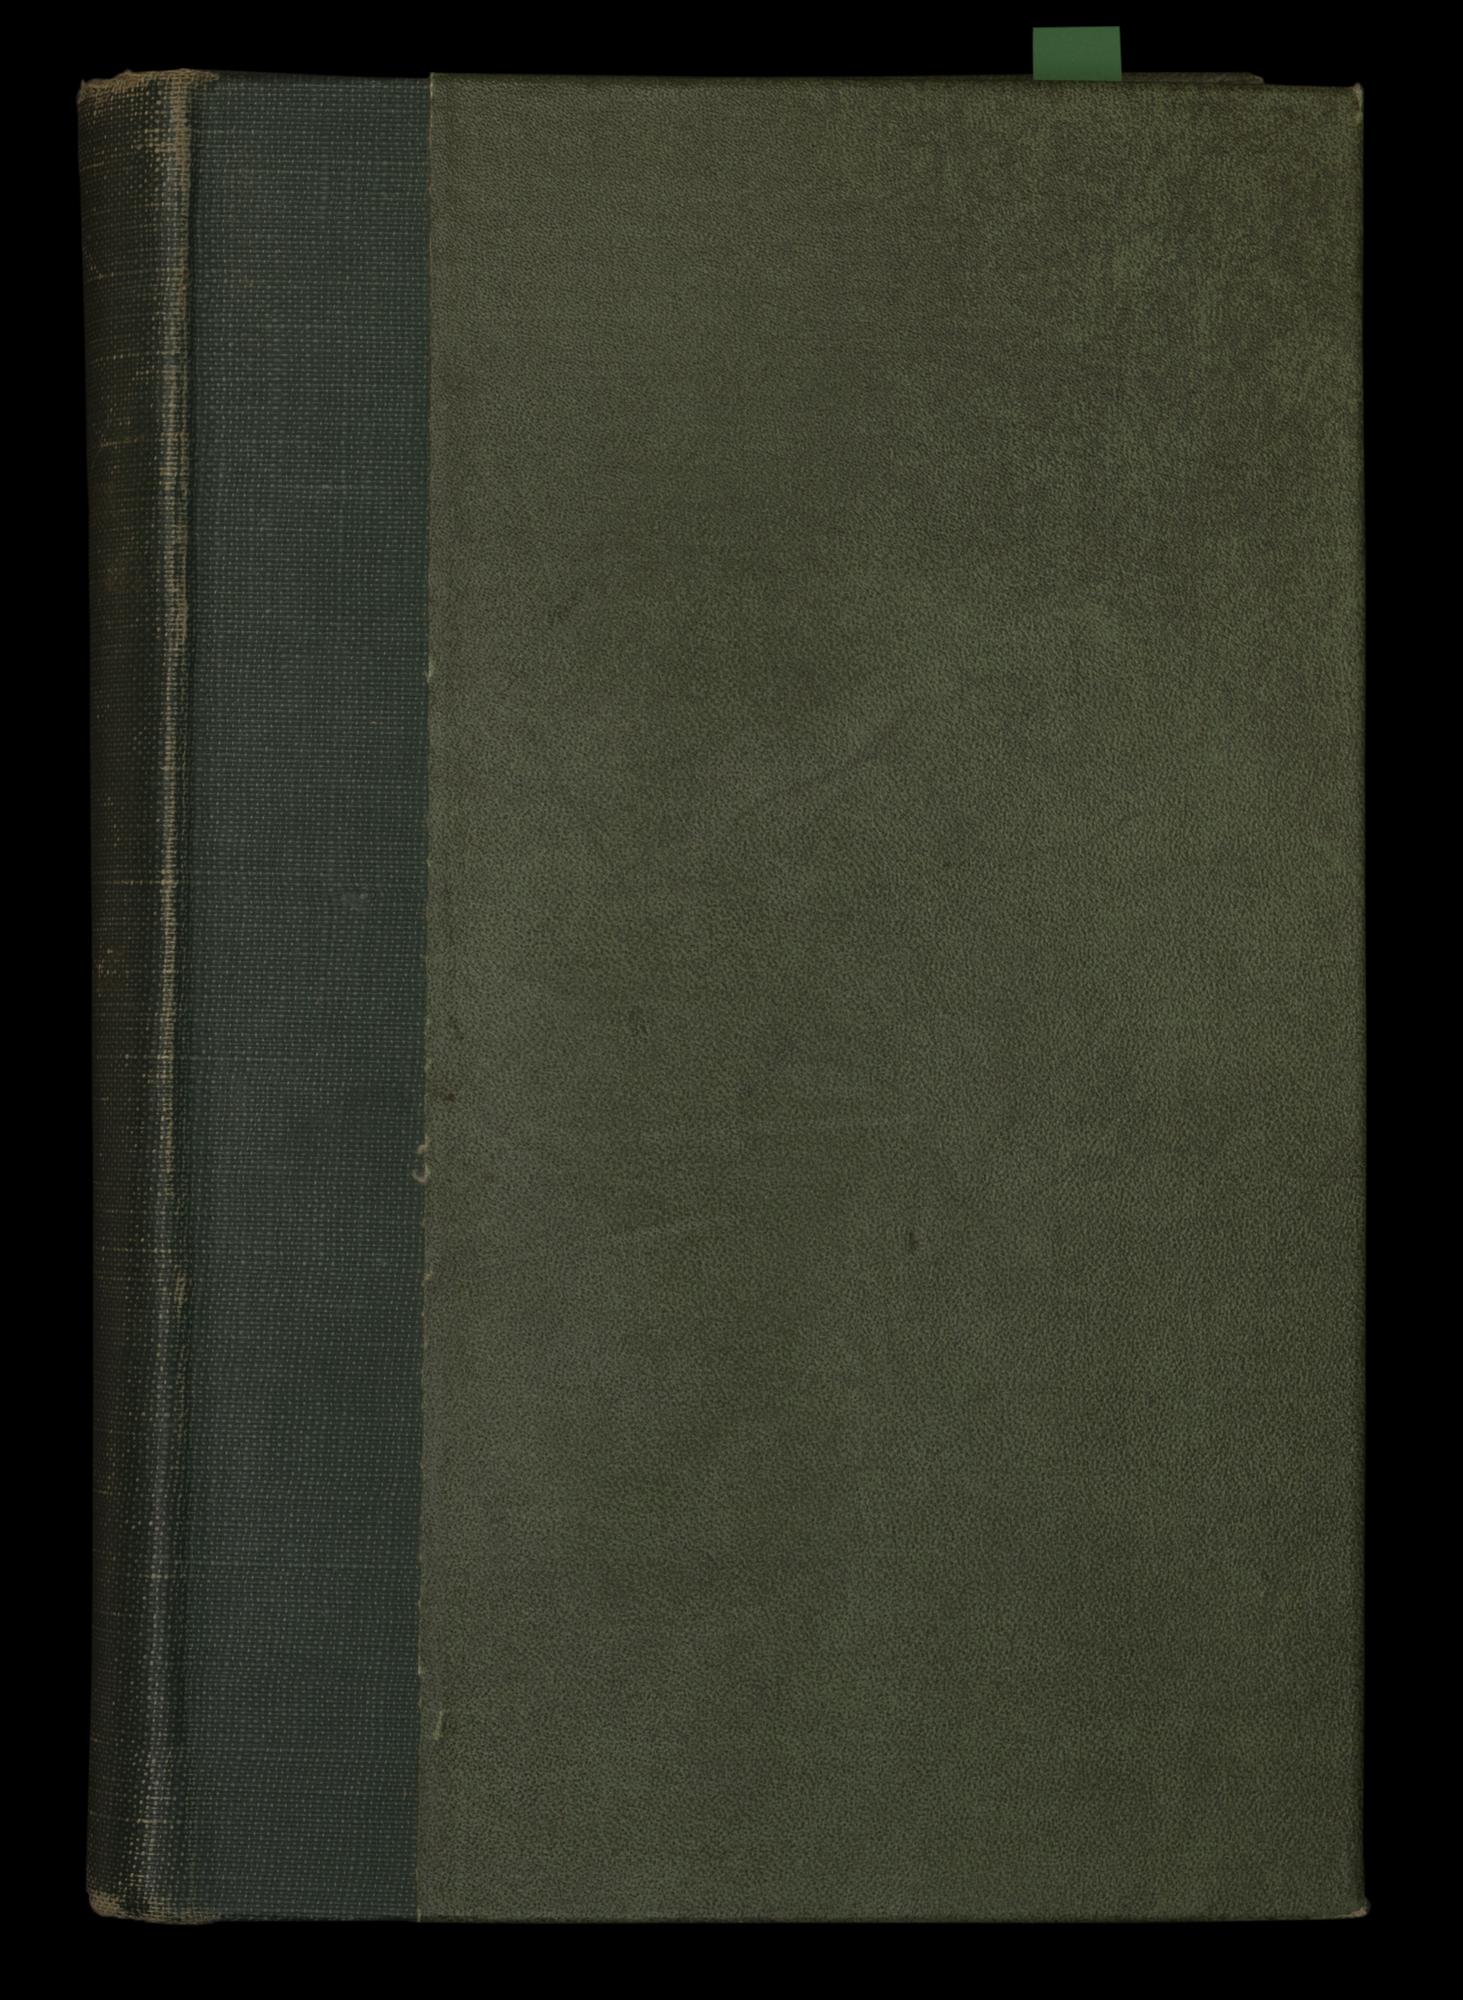 HB_ProgramBook_Cover_1925.jpg